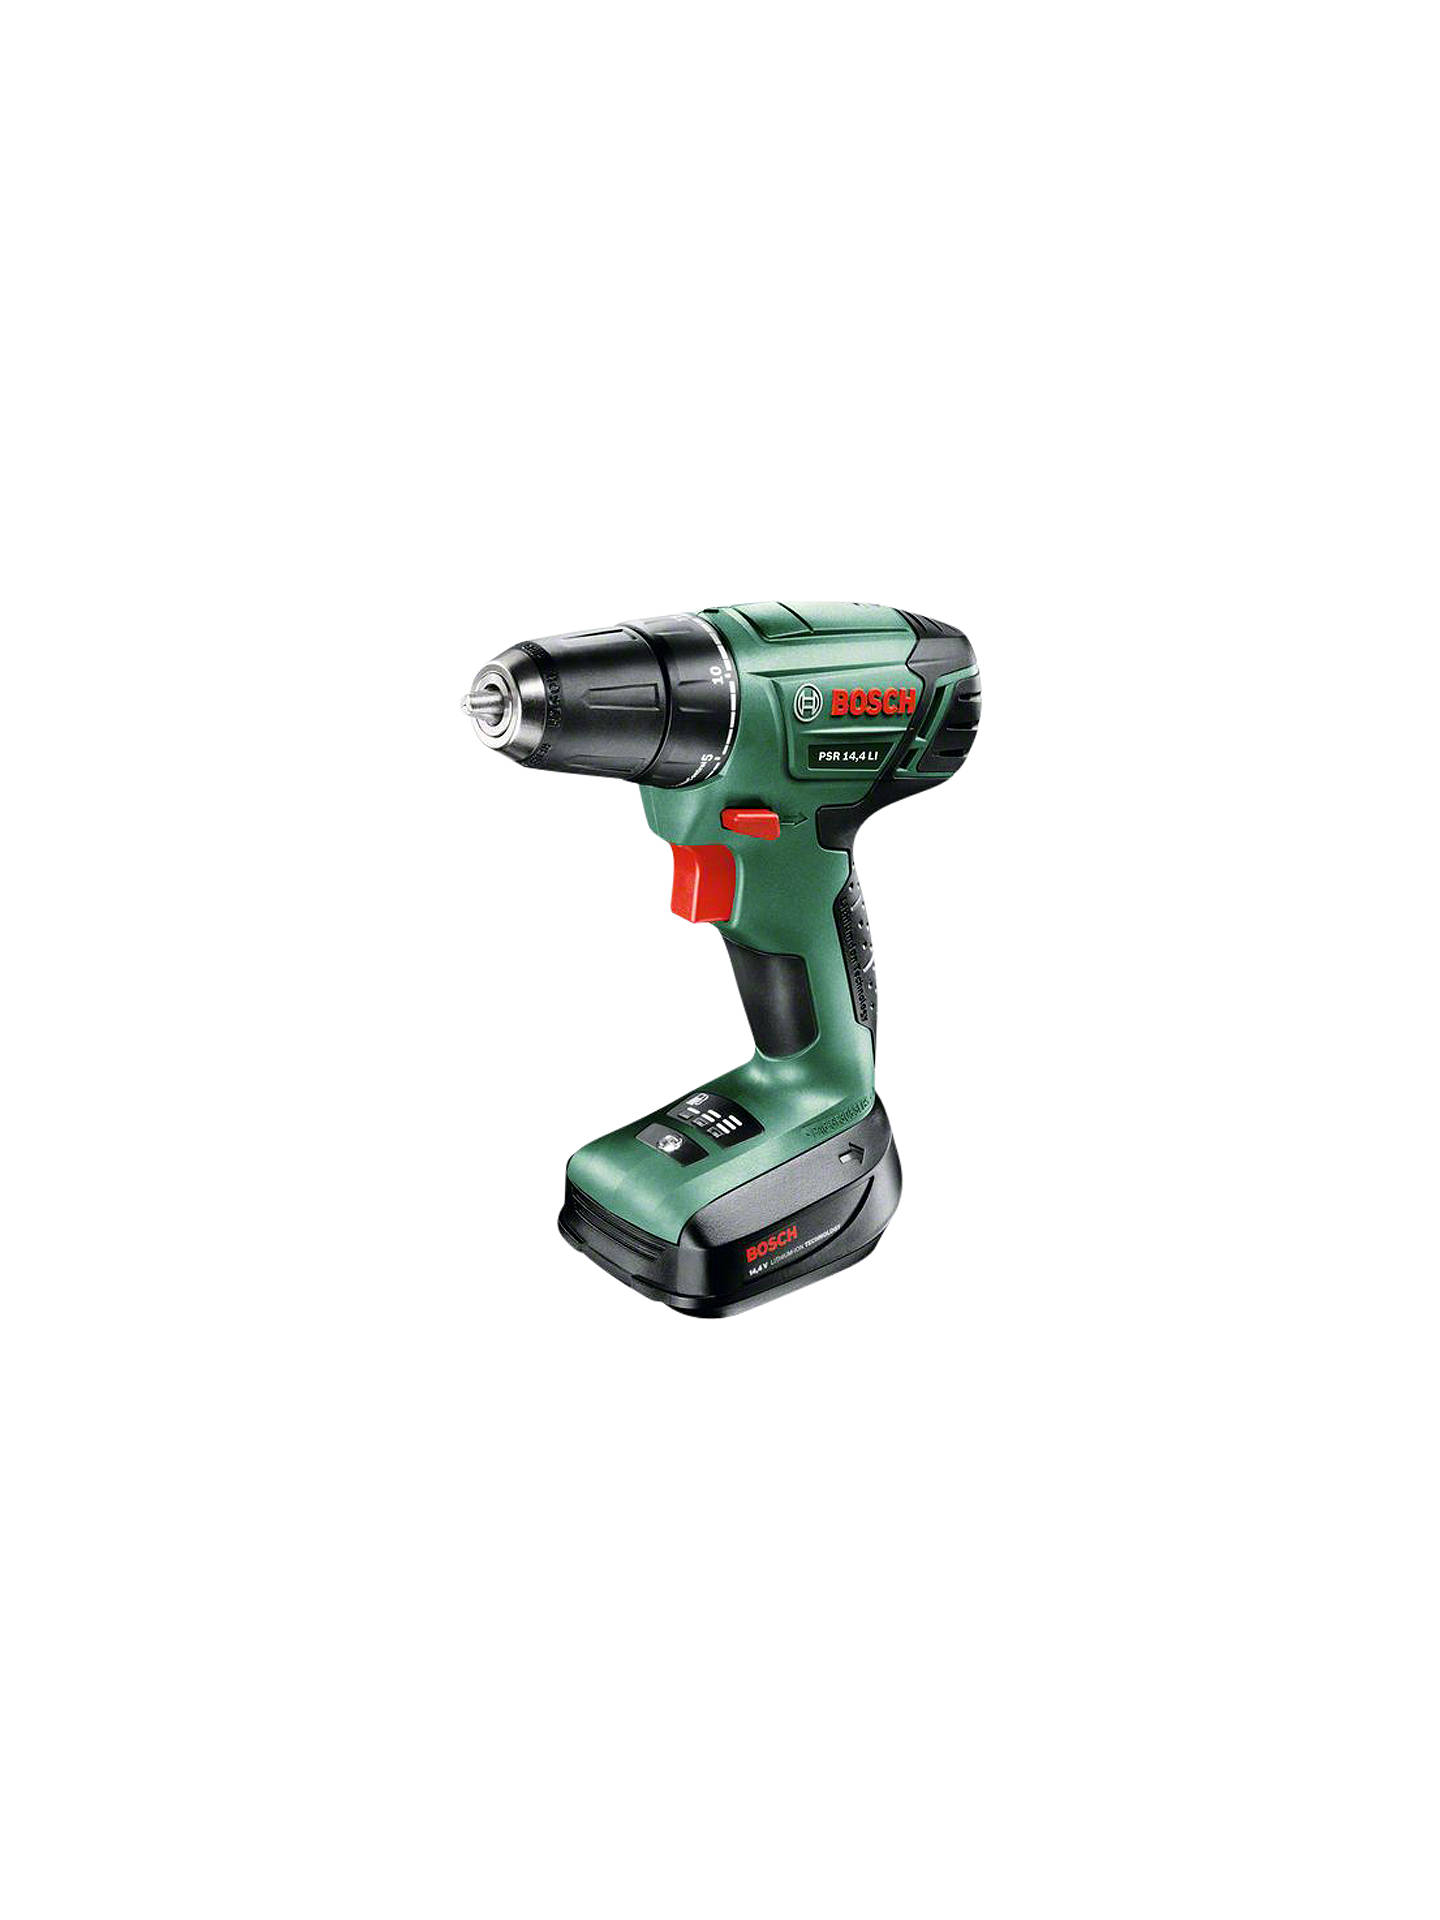 Bekend Bosch PSR 14.4 LI Cordless 14.4 Volt Drill Driver at John Lewis EP97